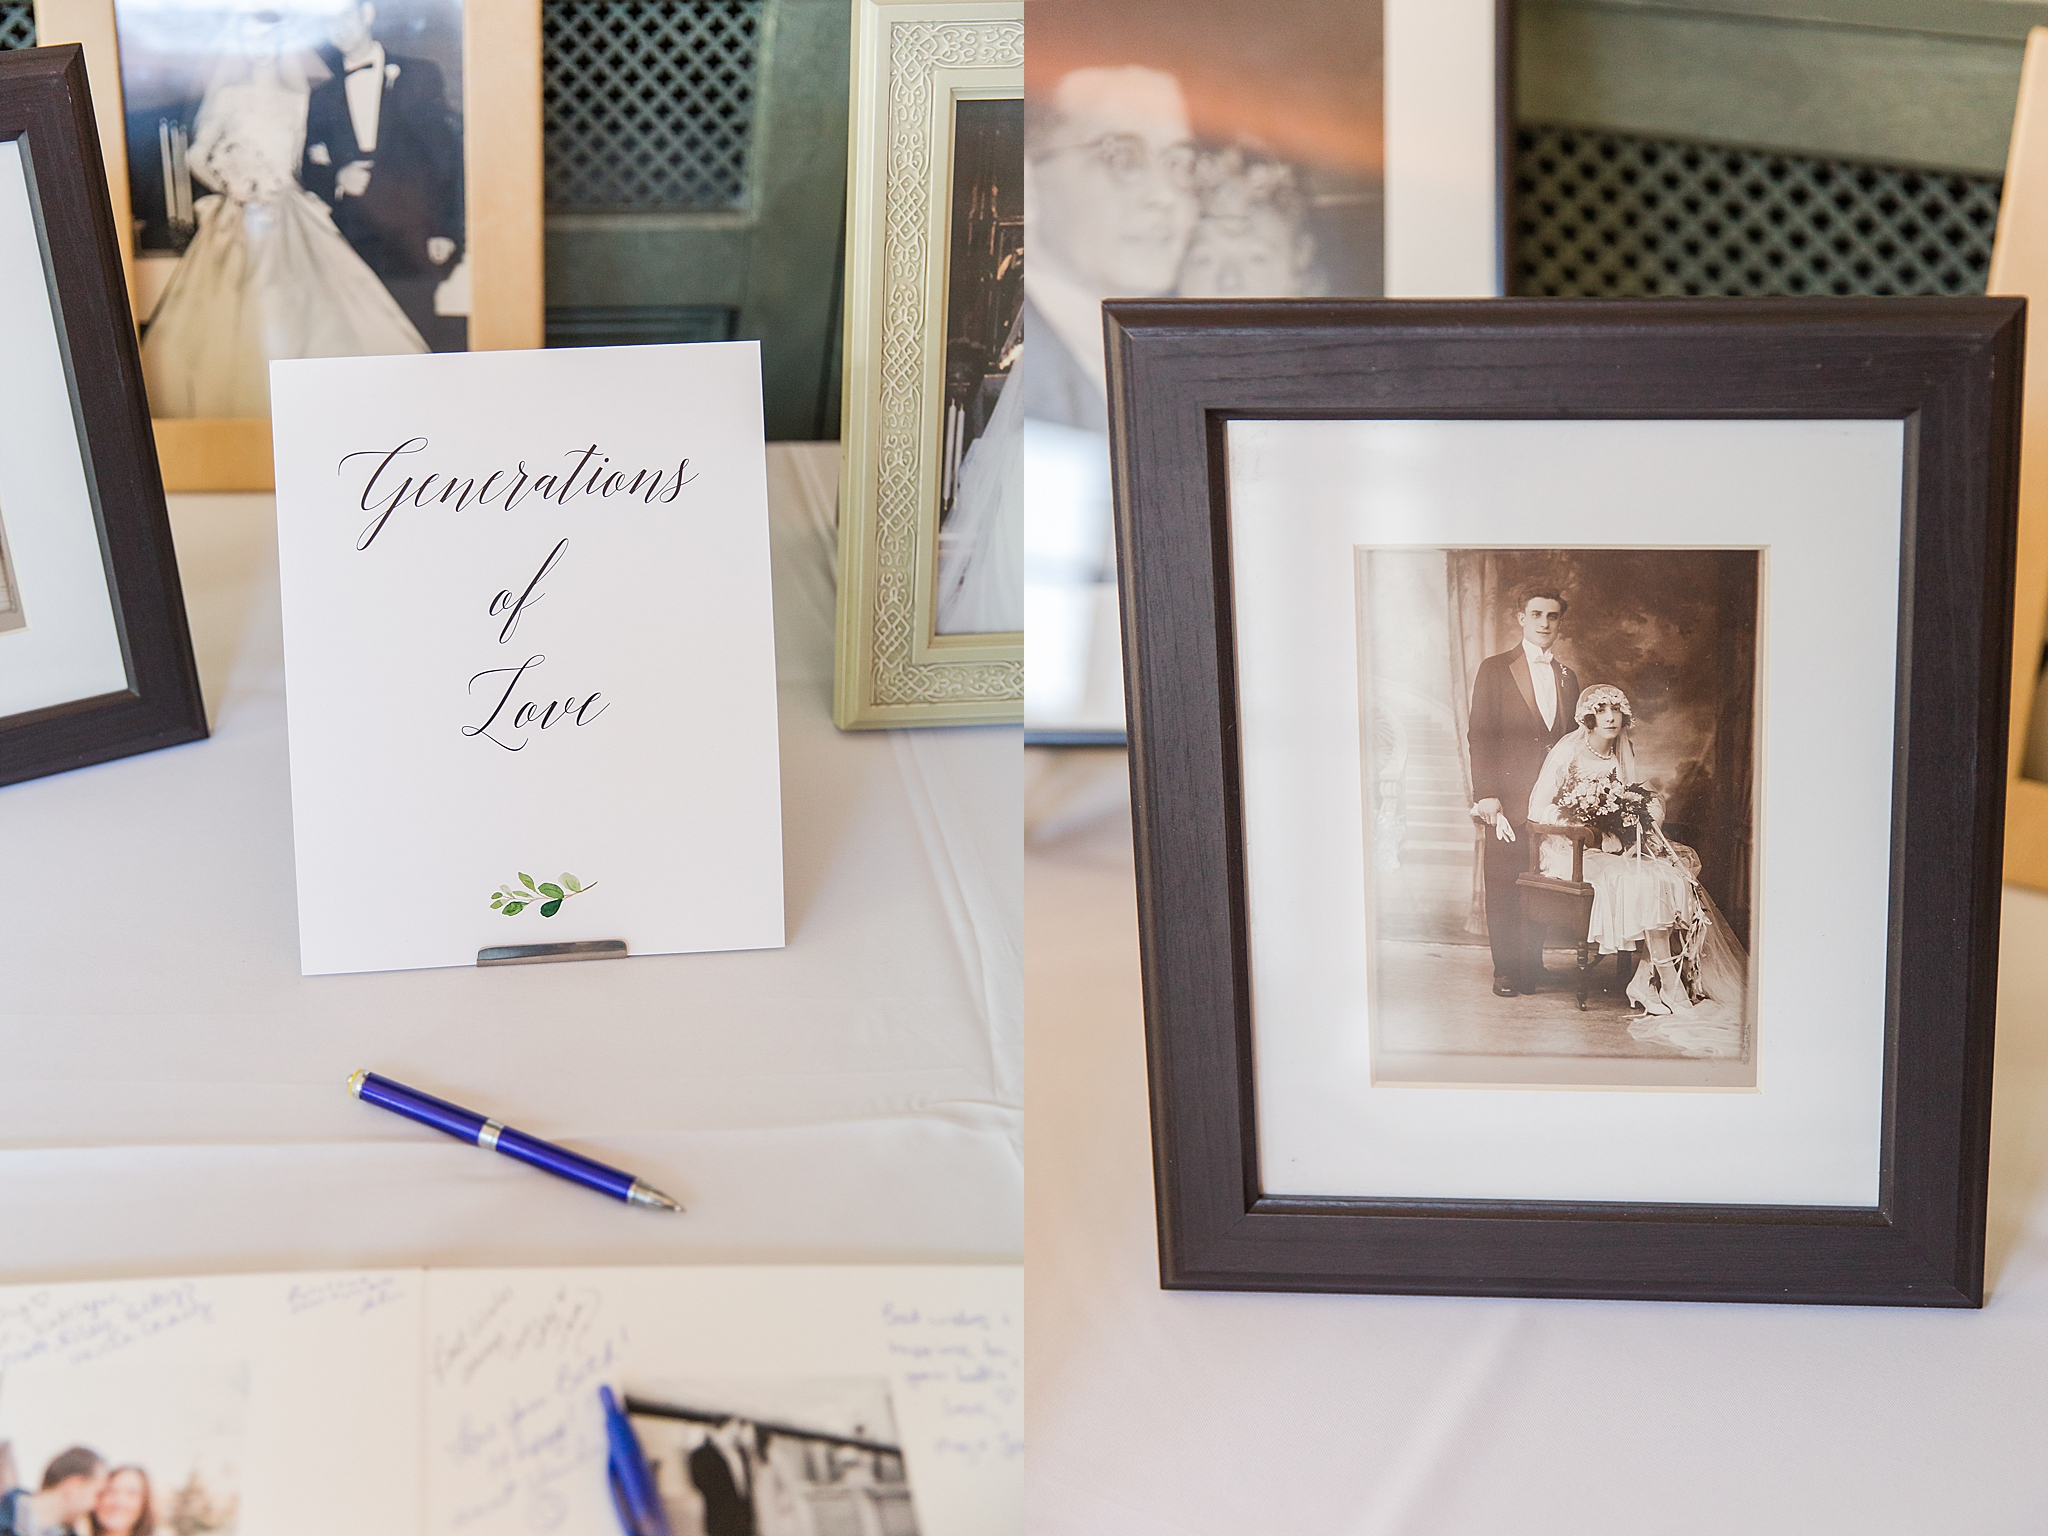 detroit-wedding-photographer-grosse-pointe-academy-chapel-detroit-golf-club-wedding-carly-matt-by-courtney-carolyn-photography_0073.jpg